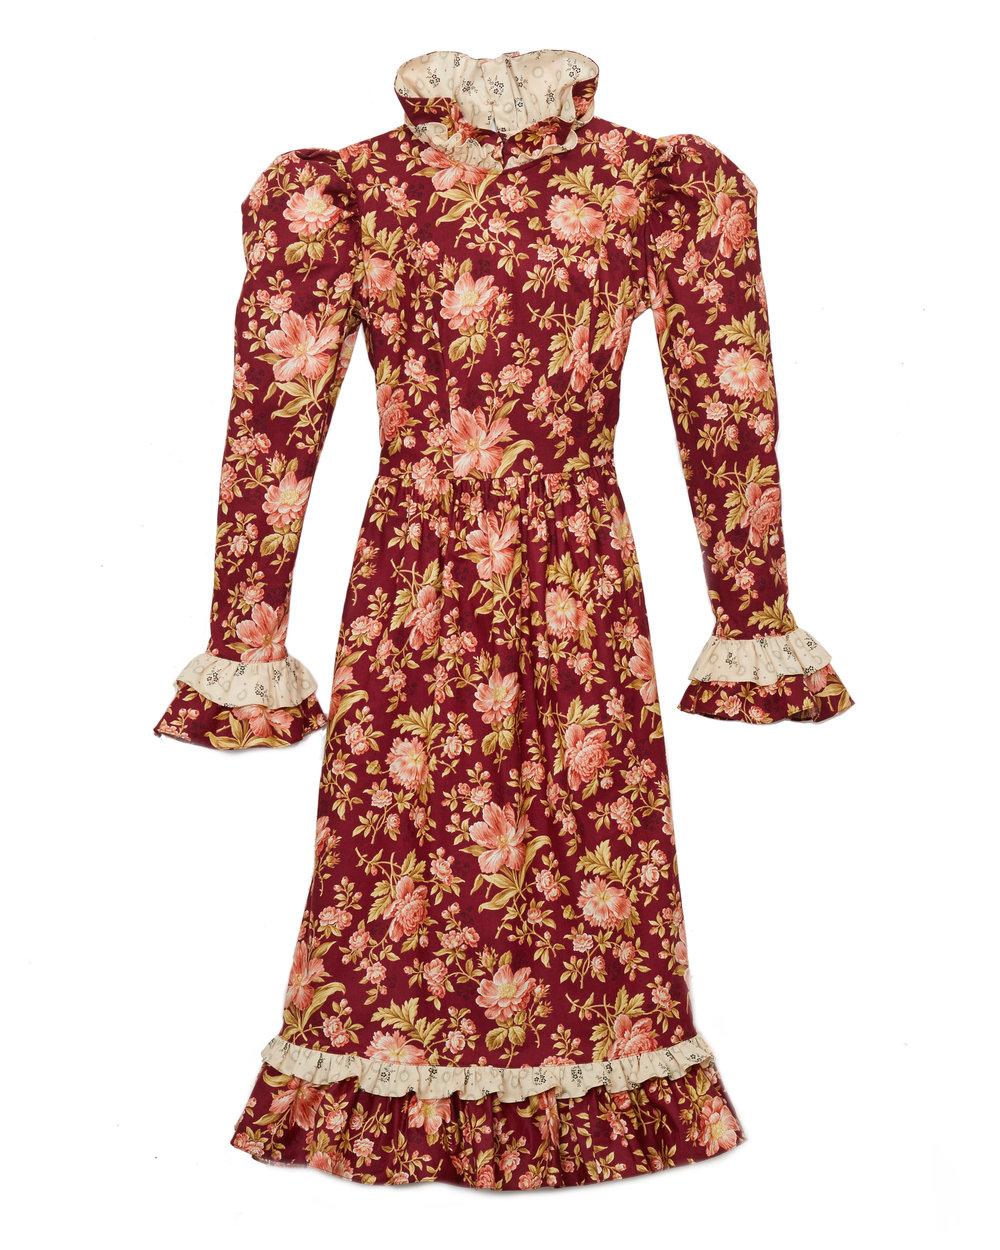 Batsheva Hay – Dress